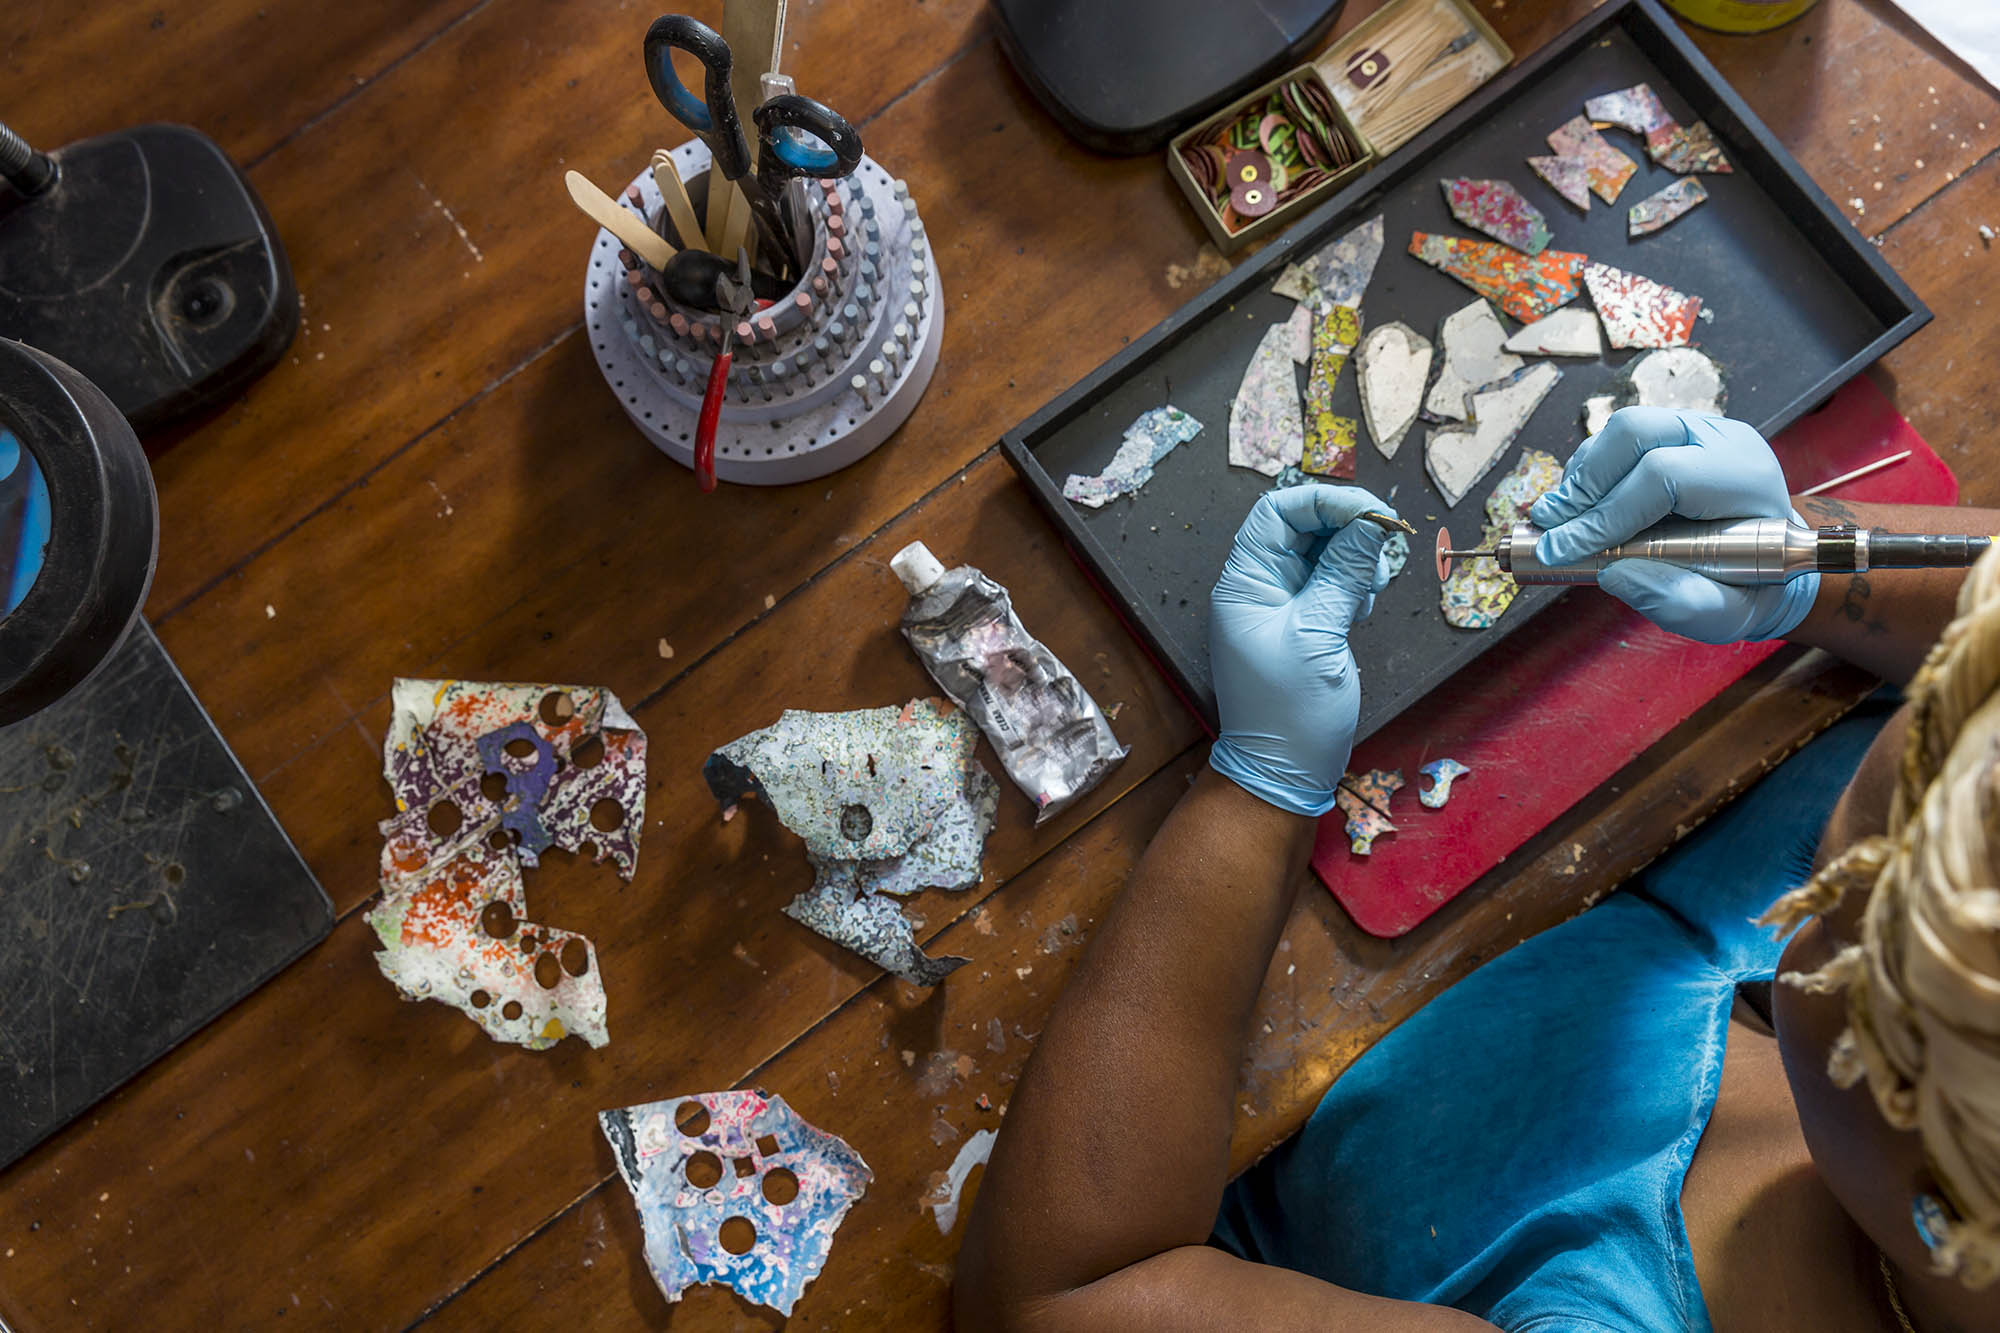 Rebel Nell Transforms Chipped Graffiti into Stunning Jewelry